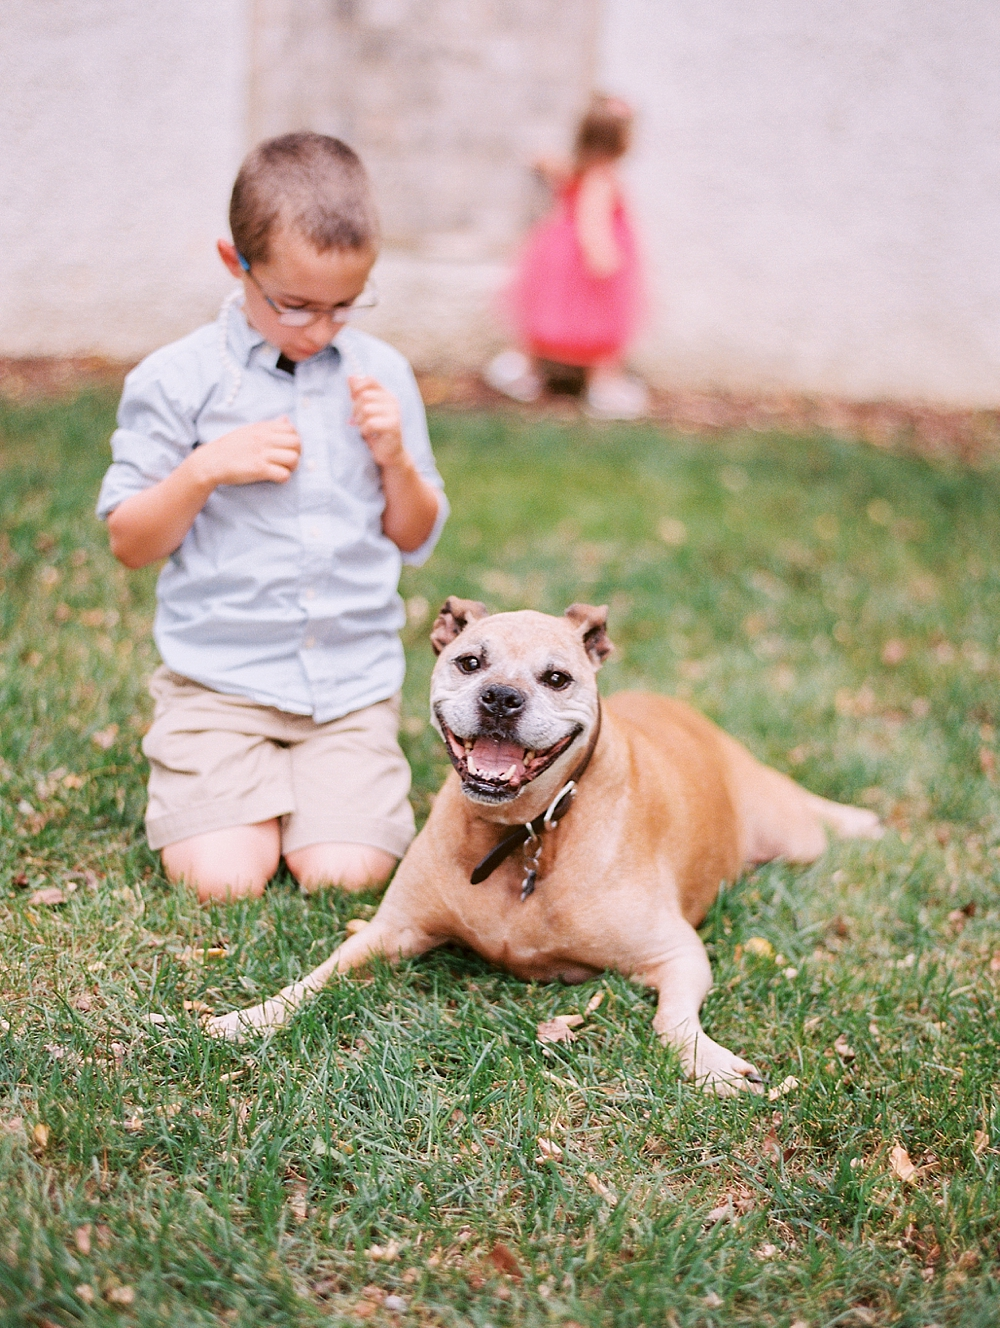 kristin-la-voie-photography-lifestyle-chicago-dog-75